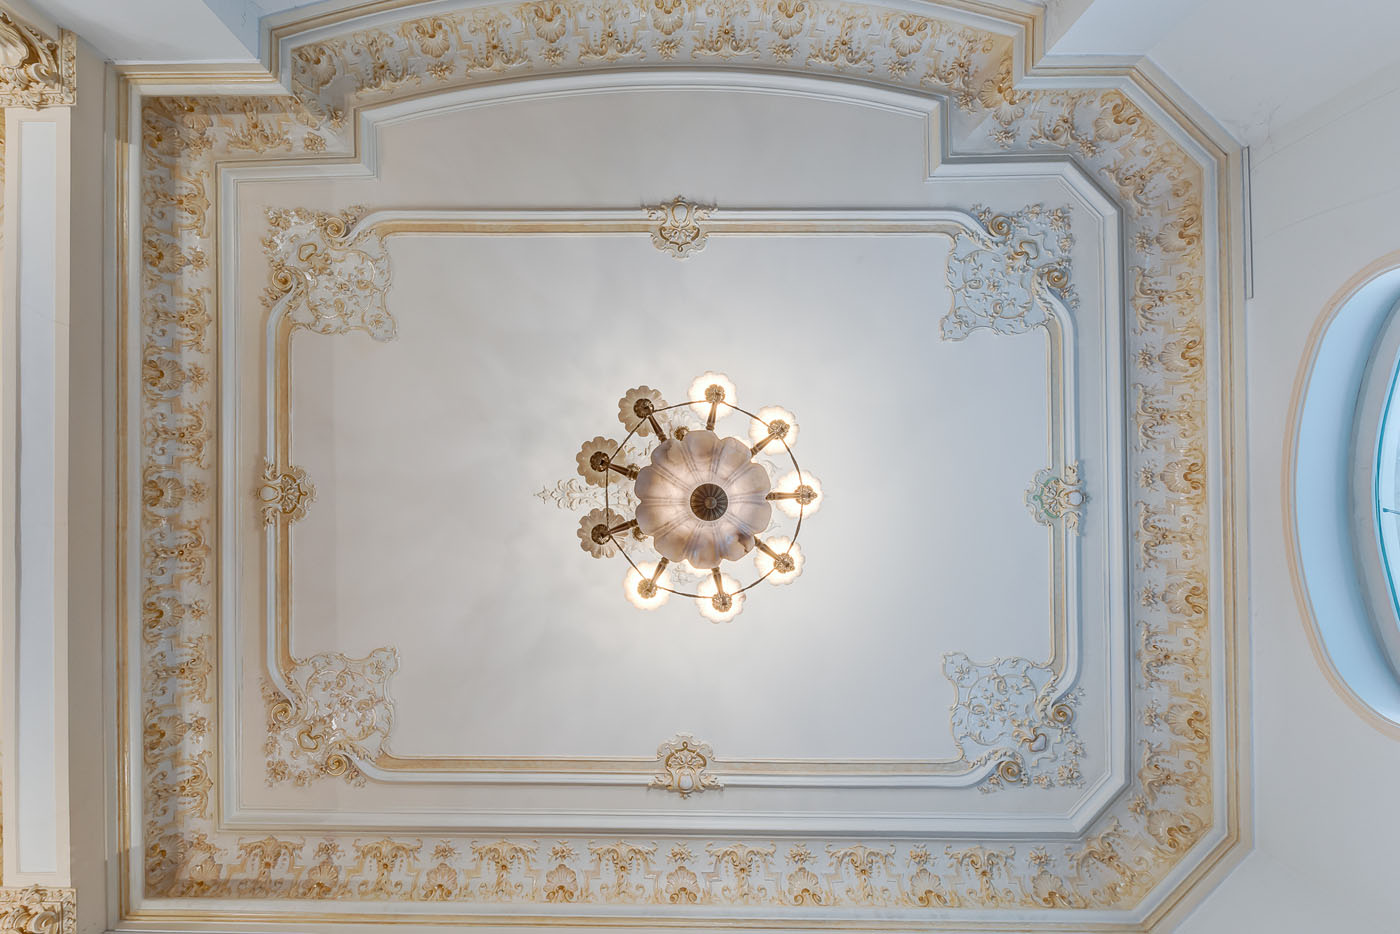 https://ahe-ro.s3.amazonaws.com/2467/vila_lascar_catargiu_20.jpg